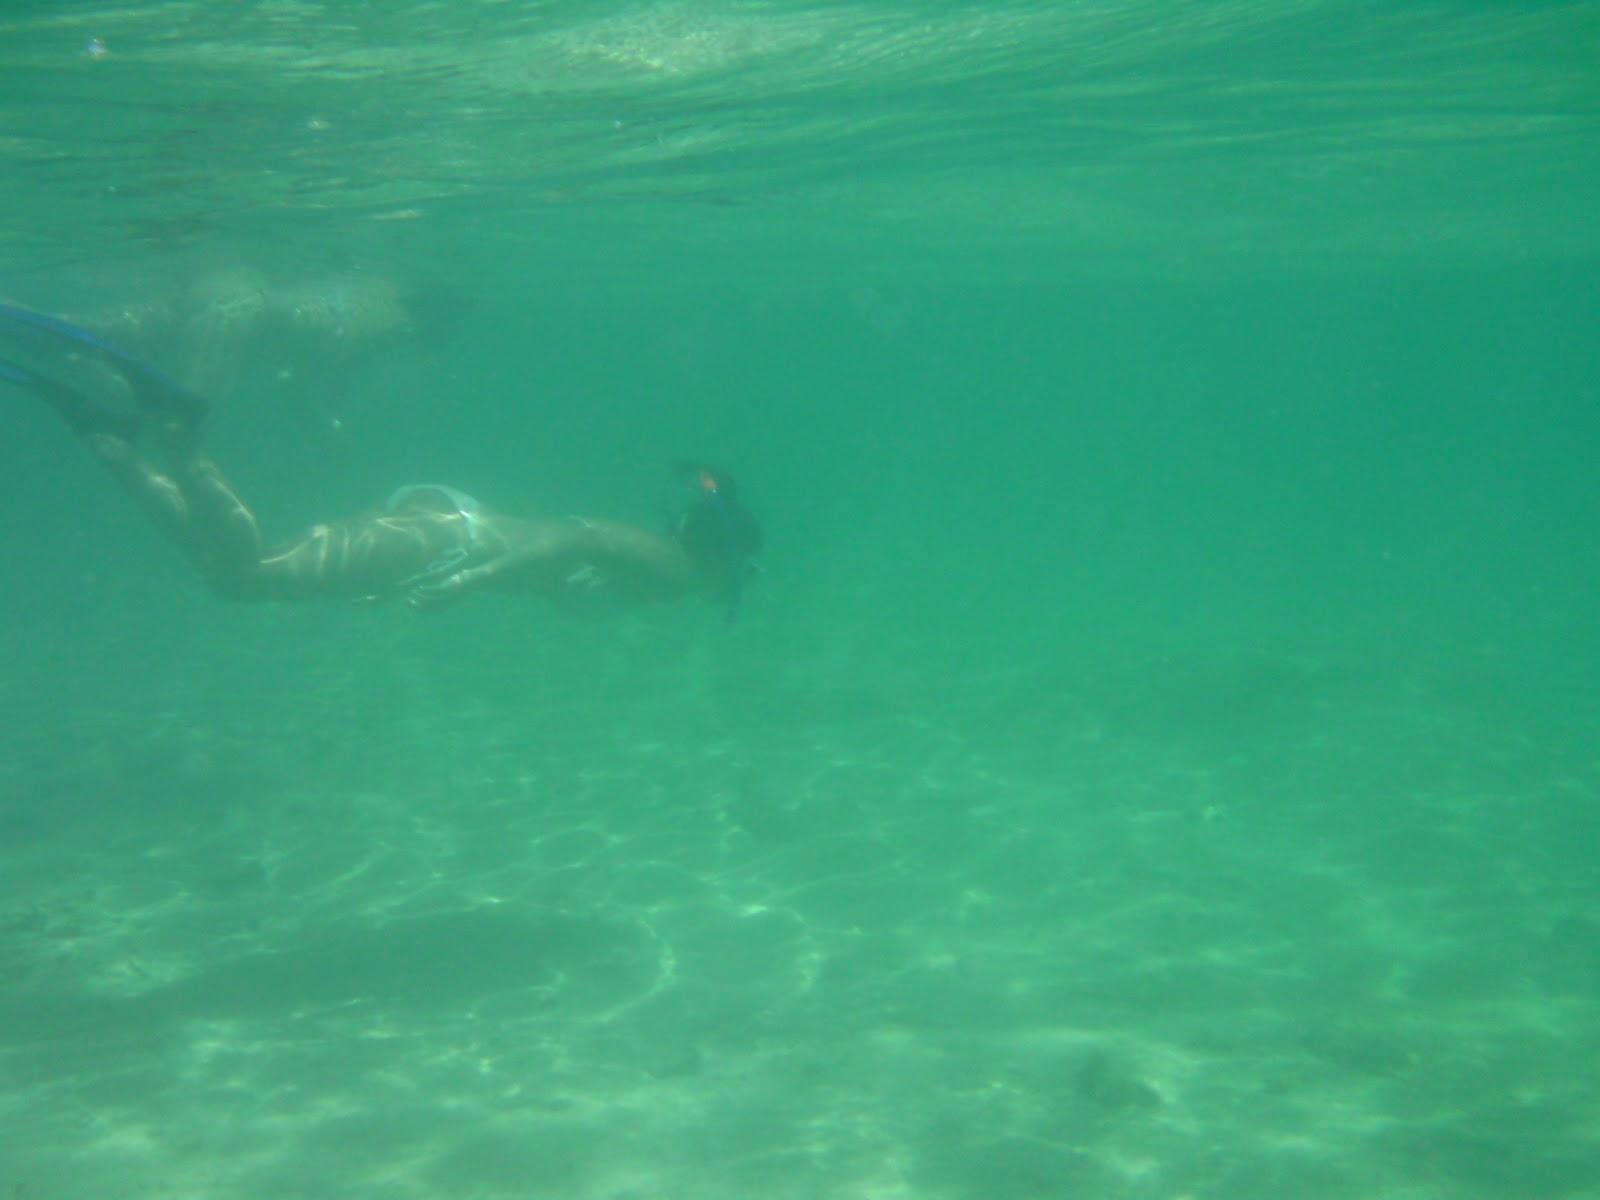 økosystemer i vand